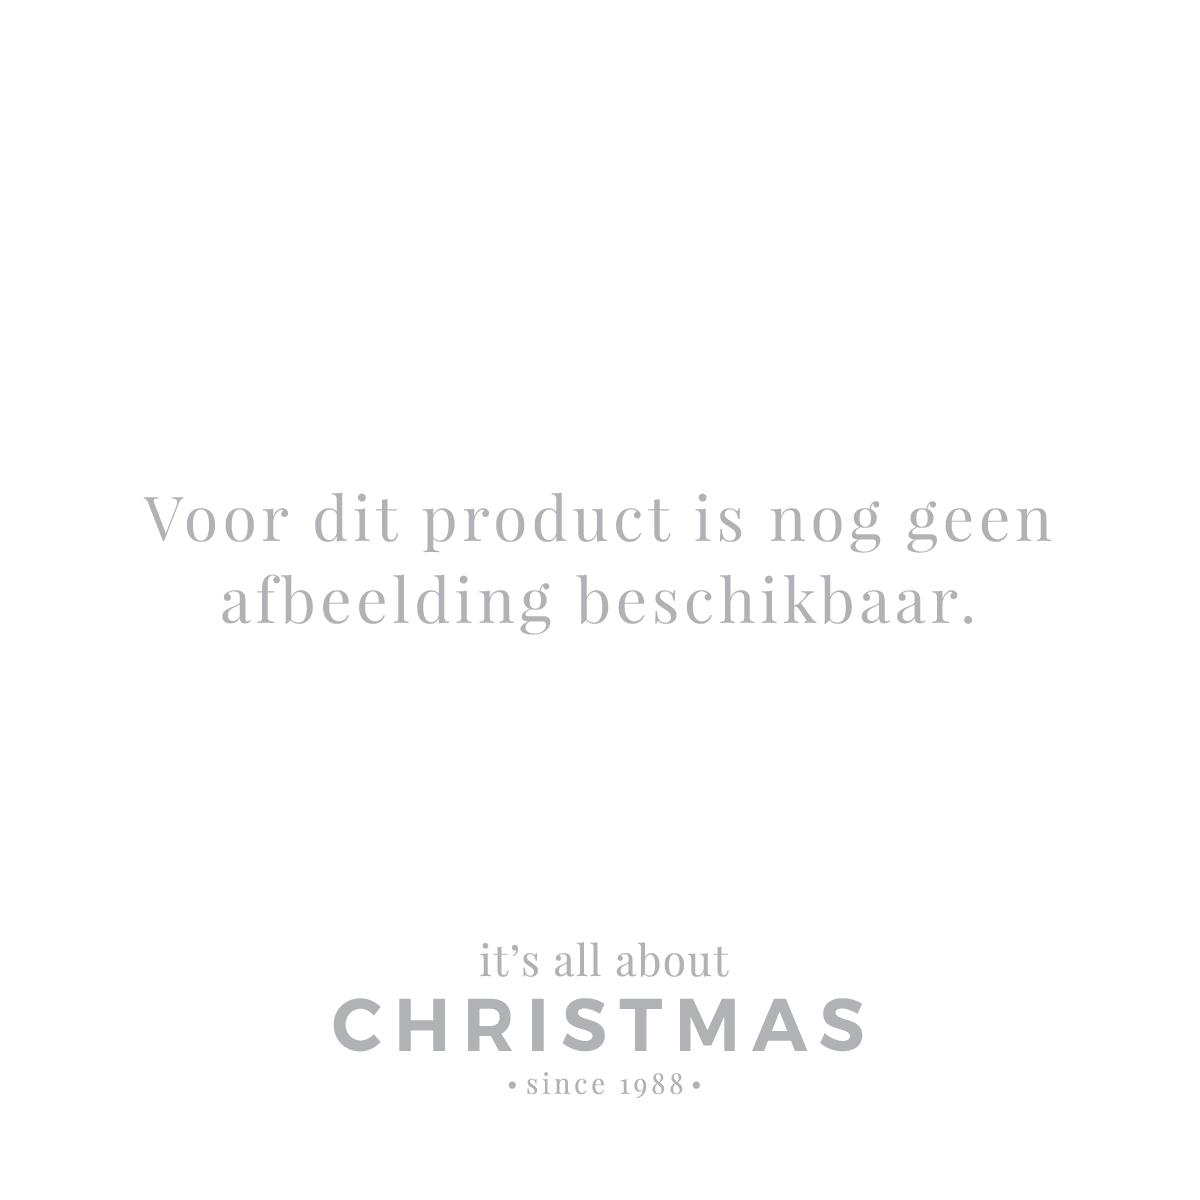 Bunte Christbaumkugeln Kunststoff.Christbaumkugeln Xxxl Bunt Farben Weihnachtsdekoration De